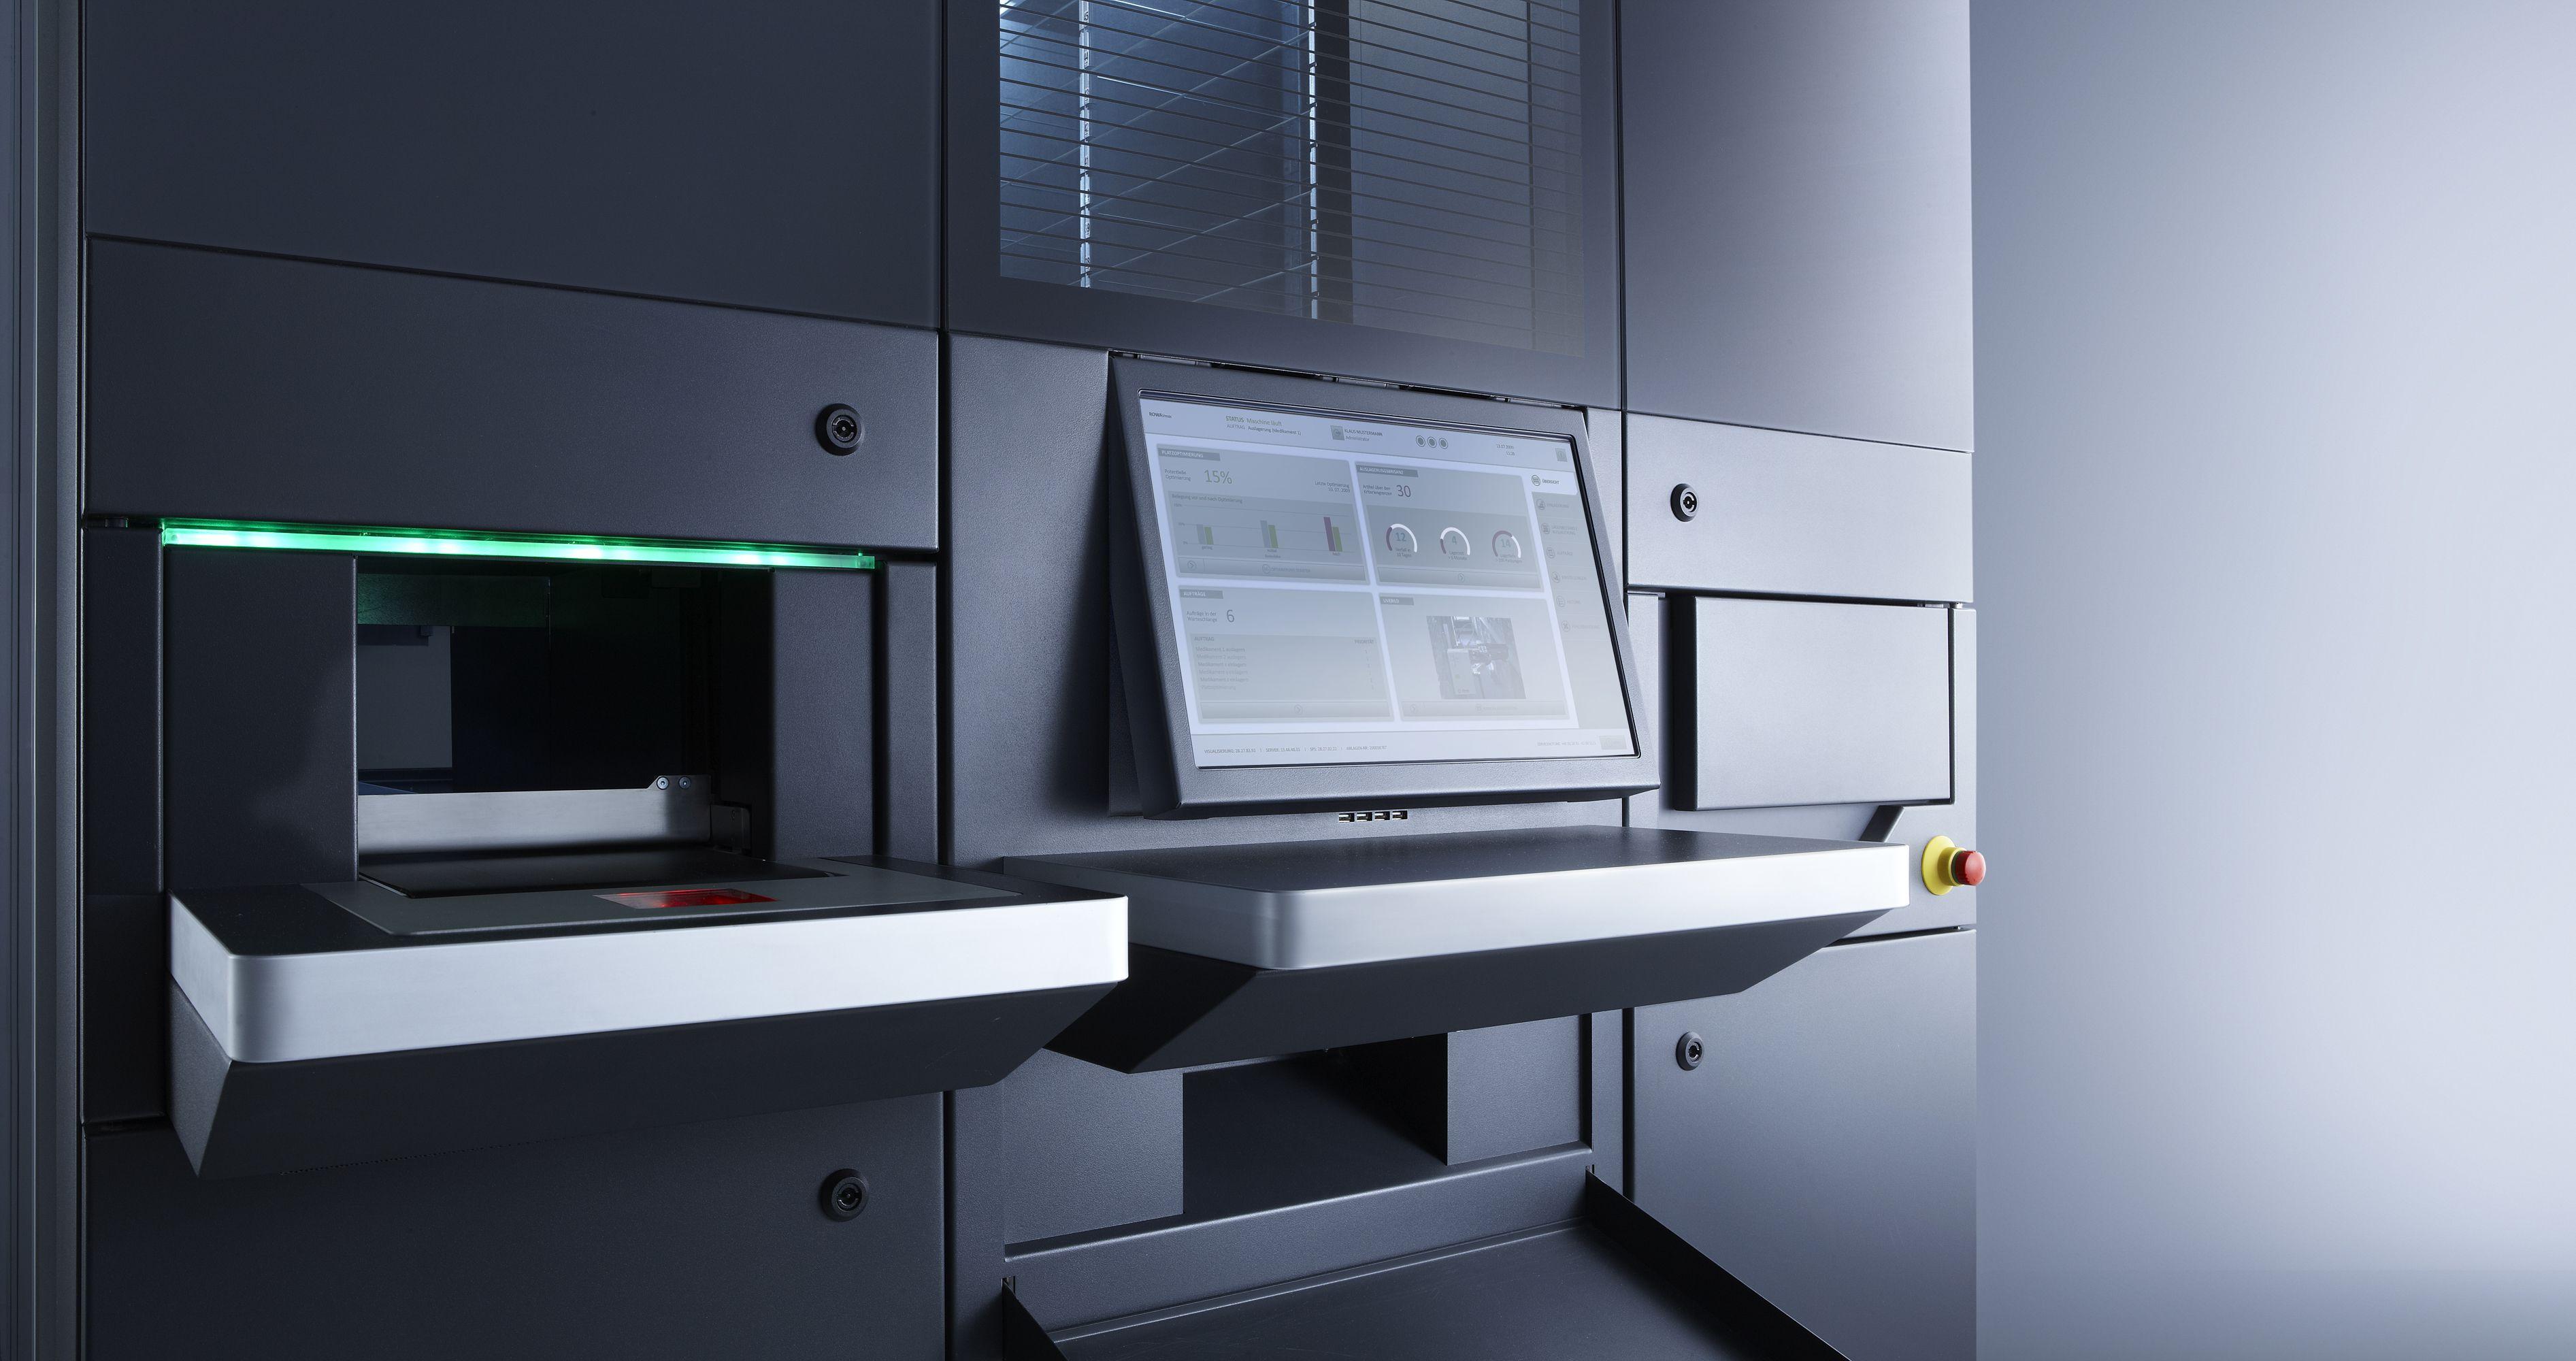 Rowa Vmax Medical design, Machine design, Locker storage